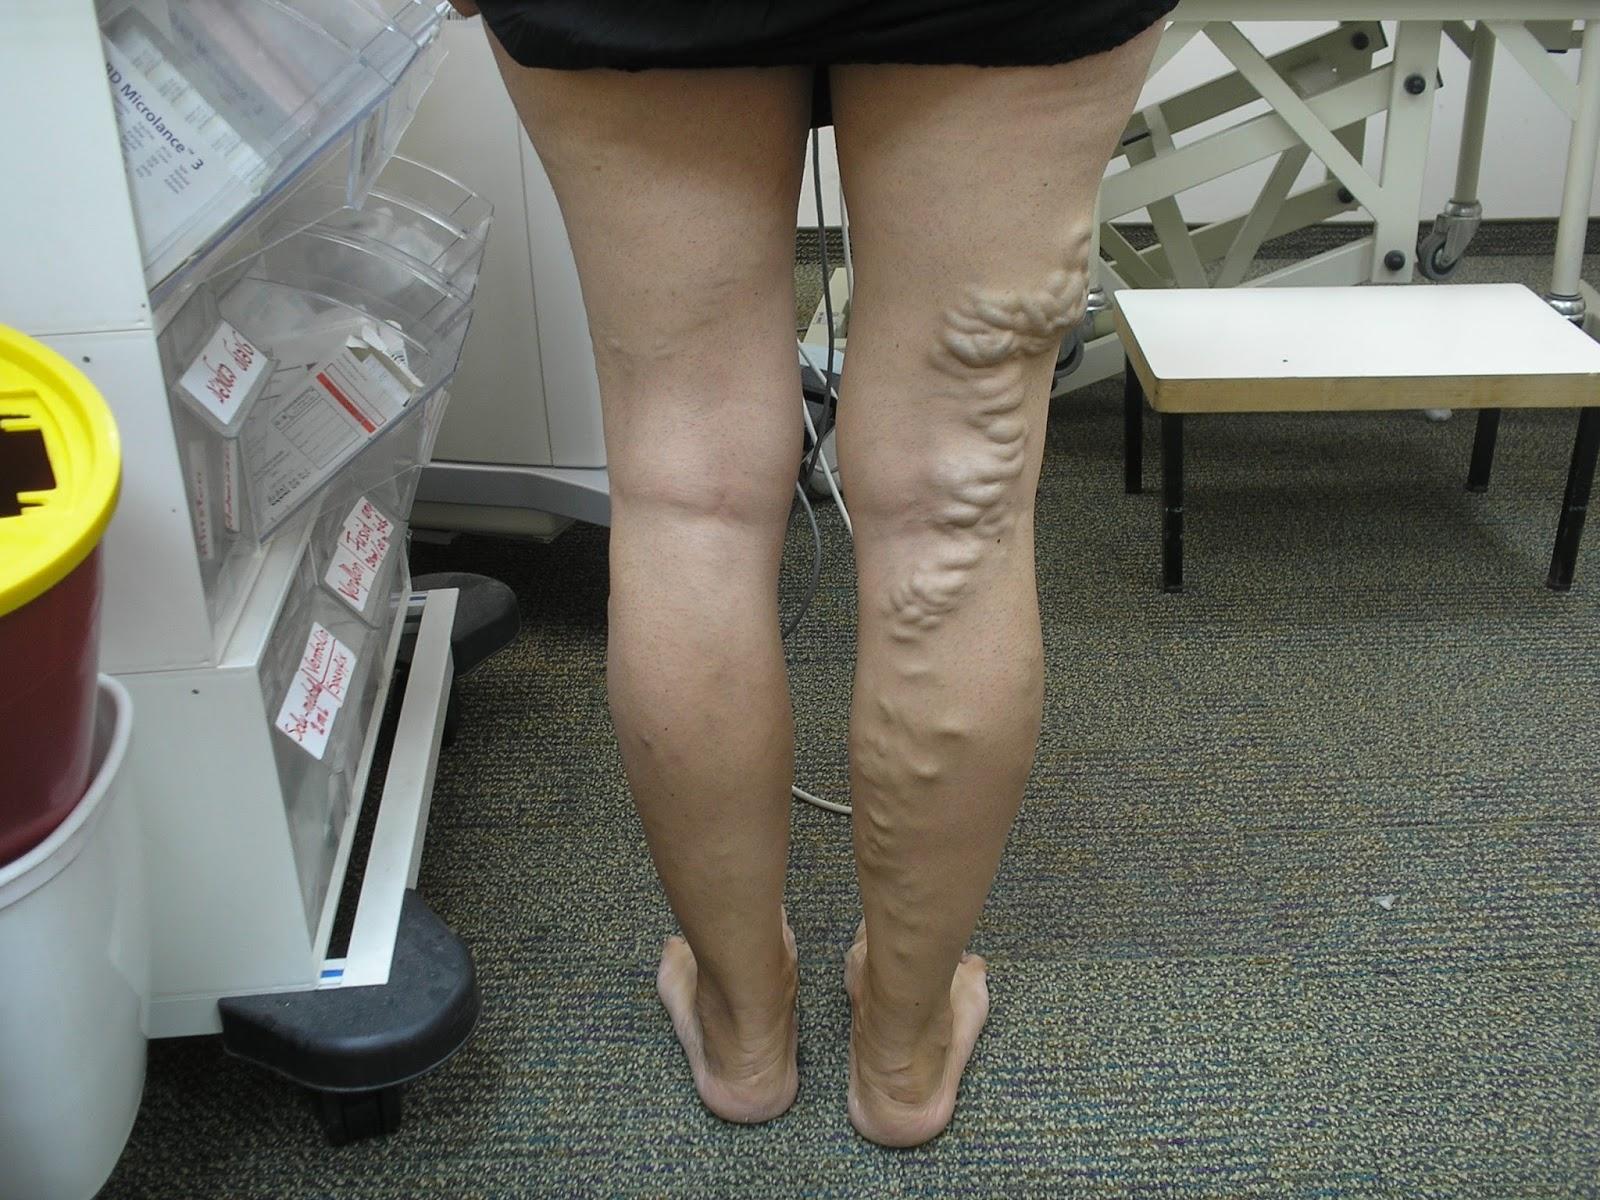 Израелско светило лекува тежки венозни проблеми - Платени публикации | varicose-veins.dptsarts.com